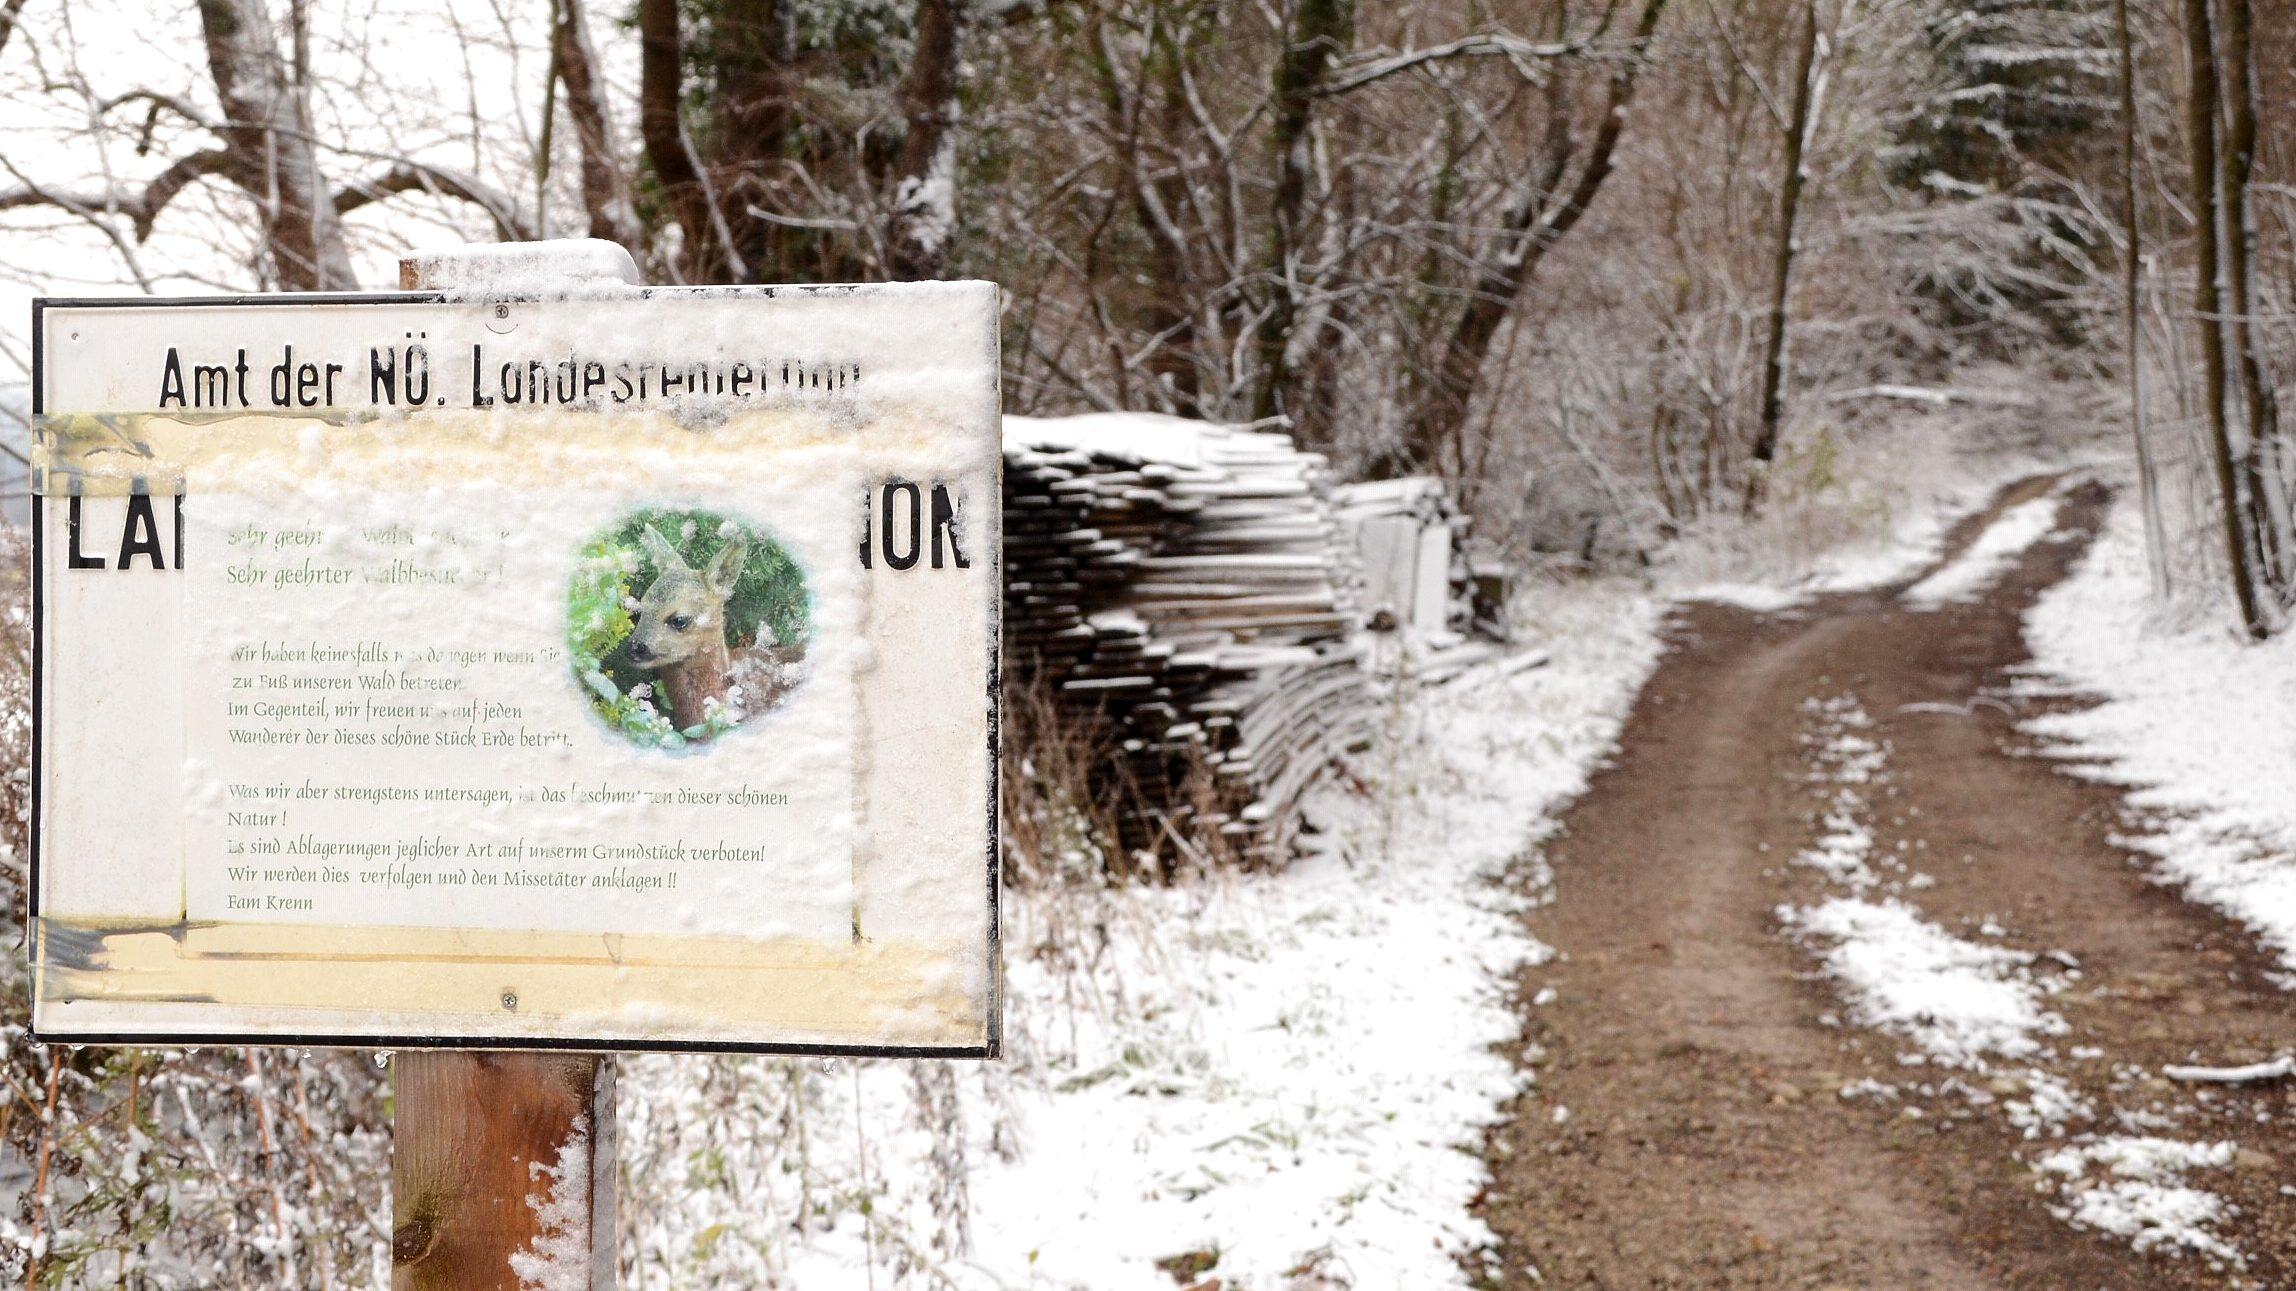 Grundstück betreten verbieten